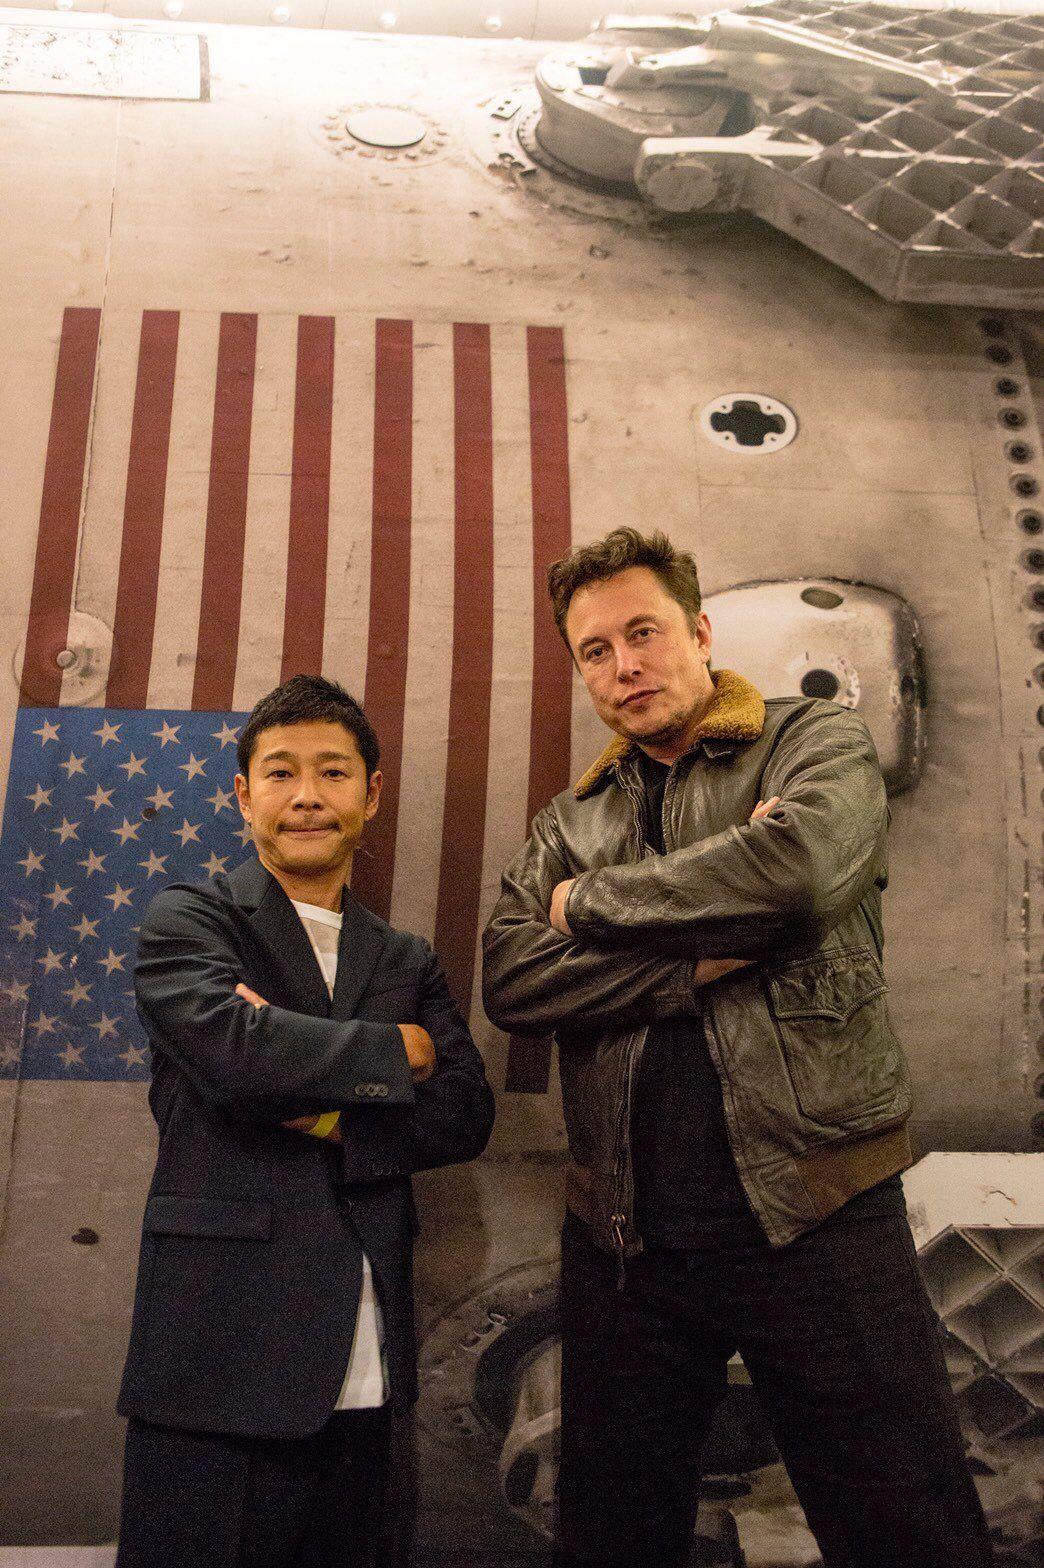 Elon Musk and the Japanese billionaire Yusaku Maezawa who's going to